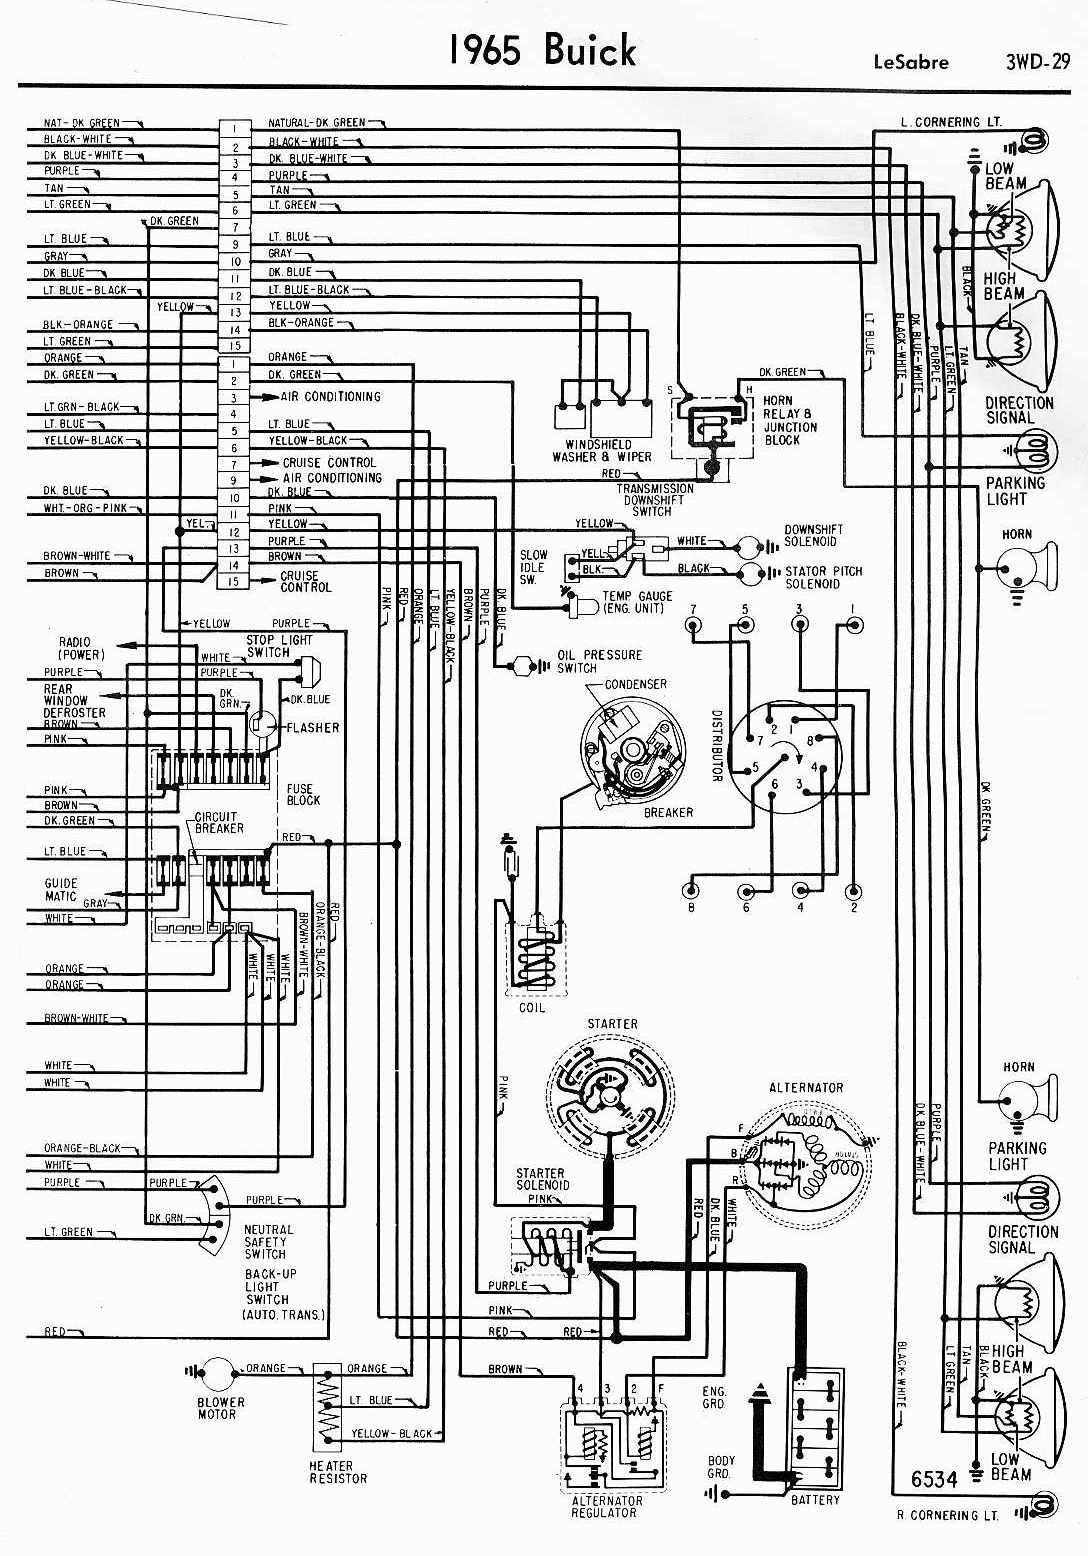 1965 Jeep Cj5 Wiring Diagram Trusted Diagrams 1974 External Regulator Schematic Harness